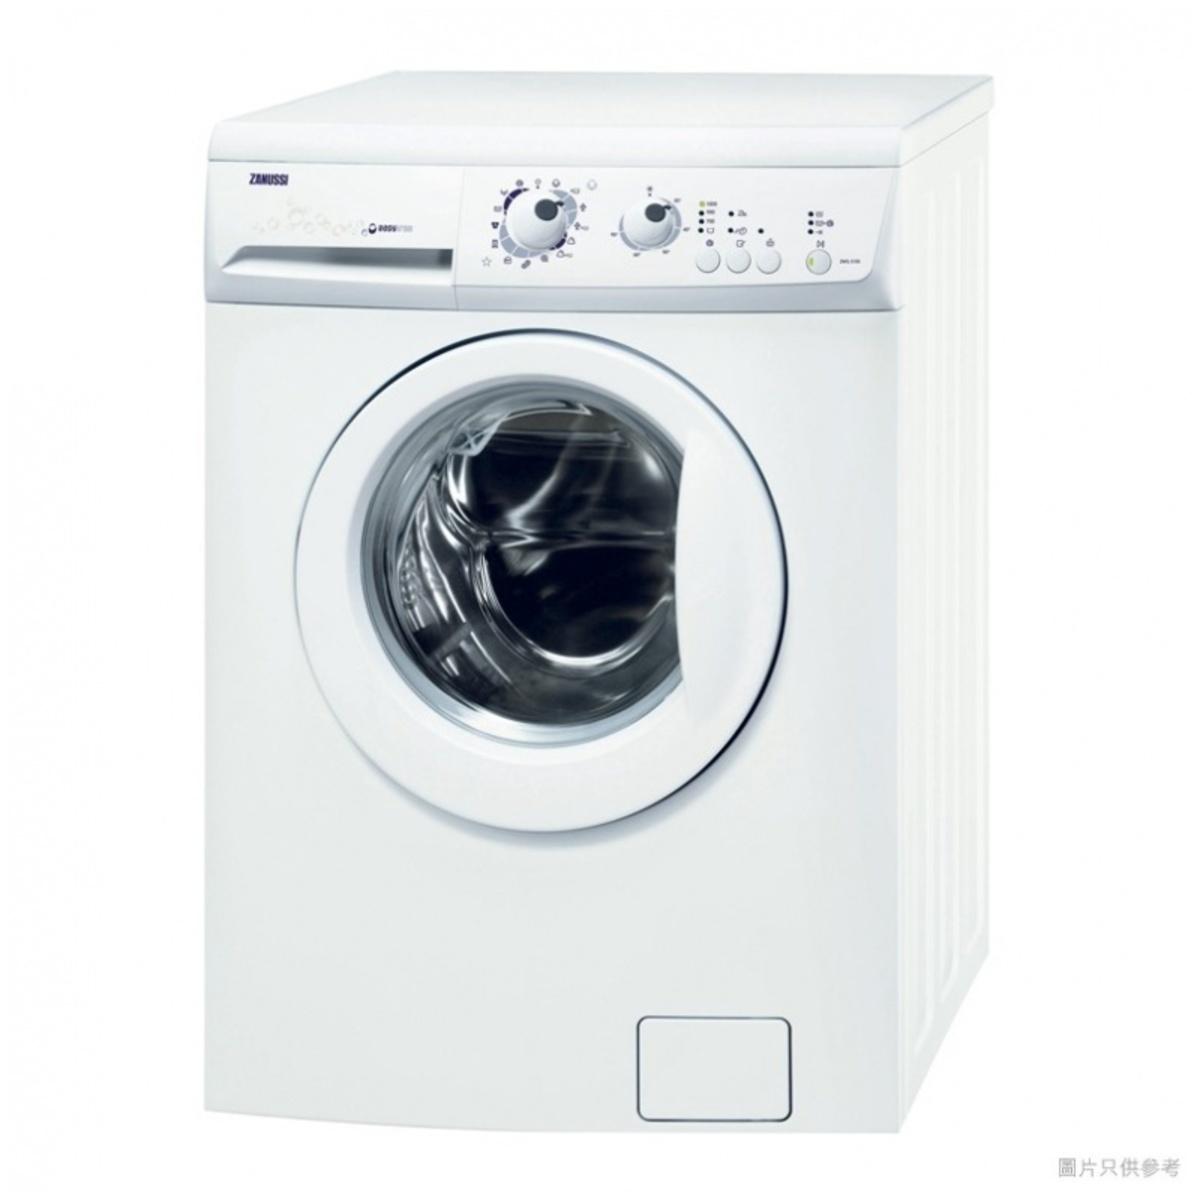 ZWS510801 6kg, 1000rpm,  Front Load Washer